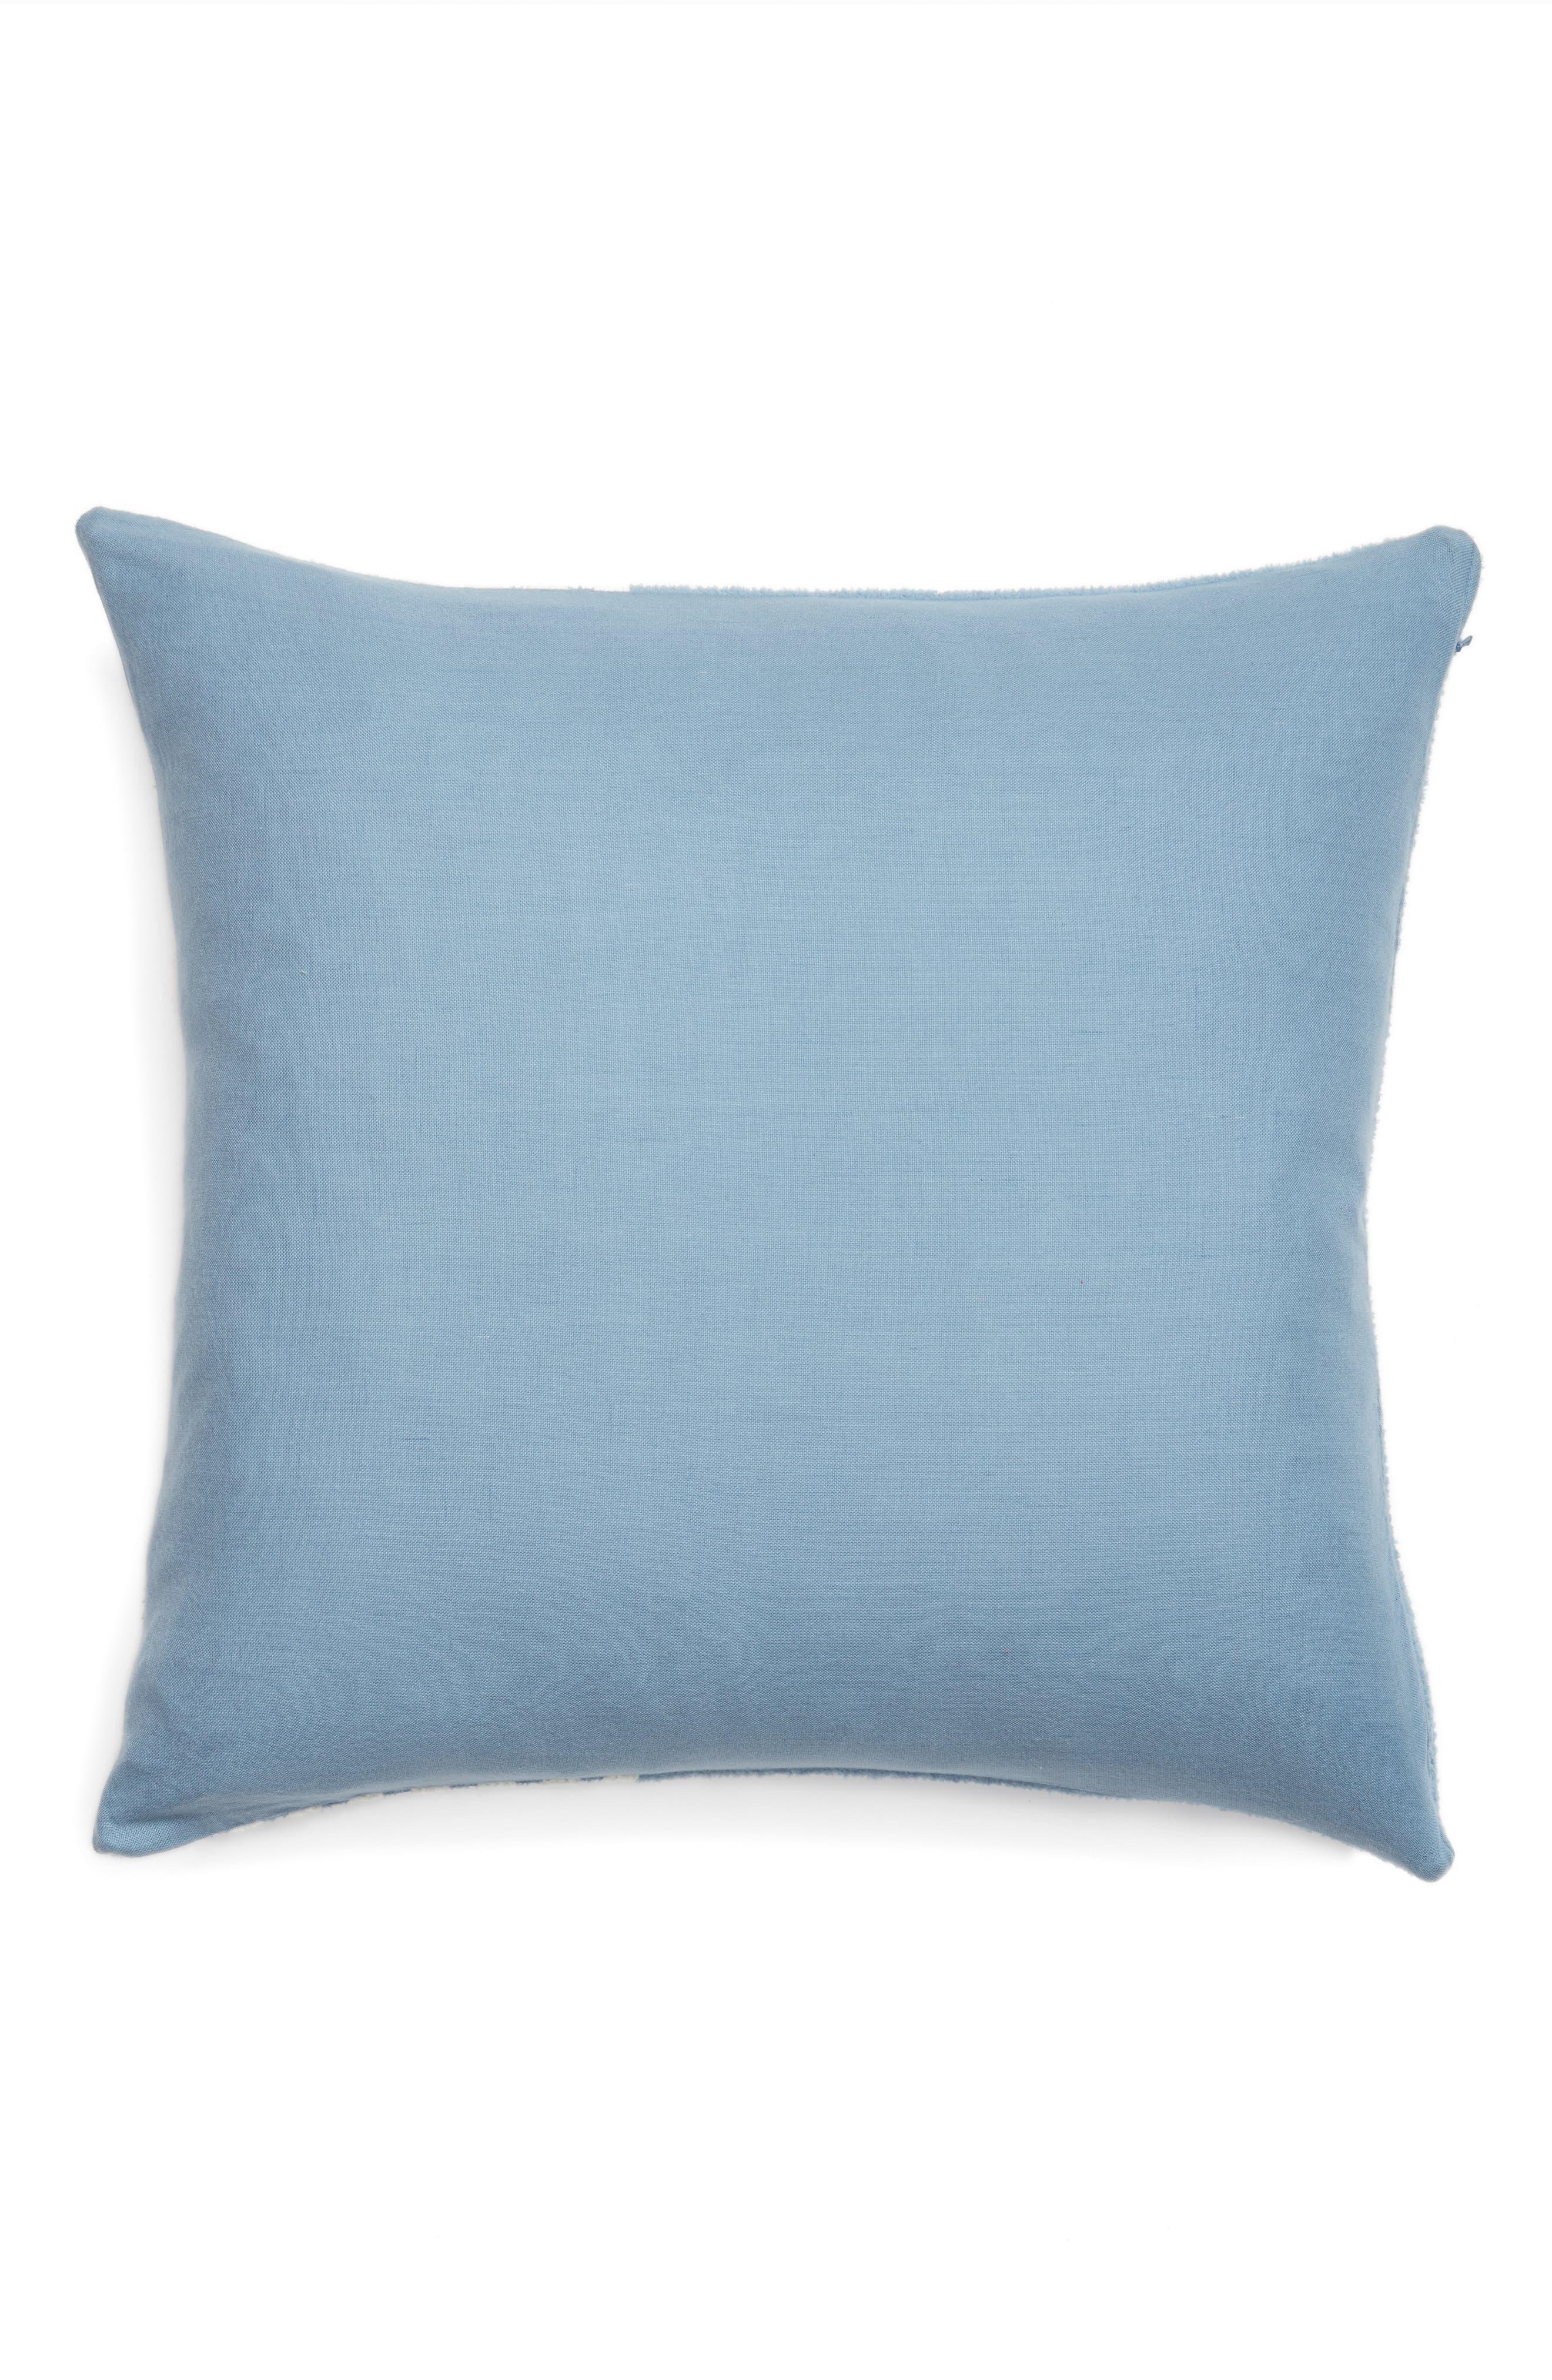 Hammam Stripe Accent Pillow,                             Alternate thumbnail 5, color,